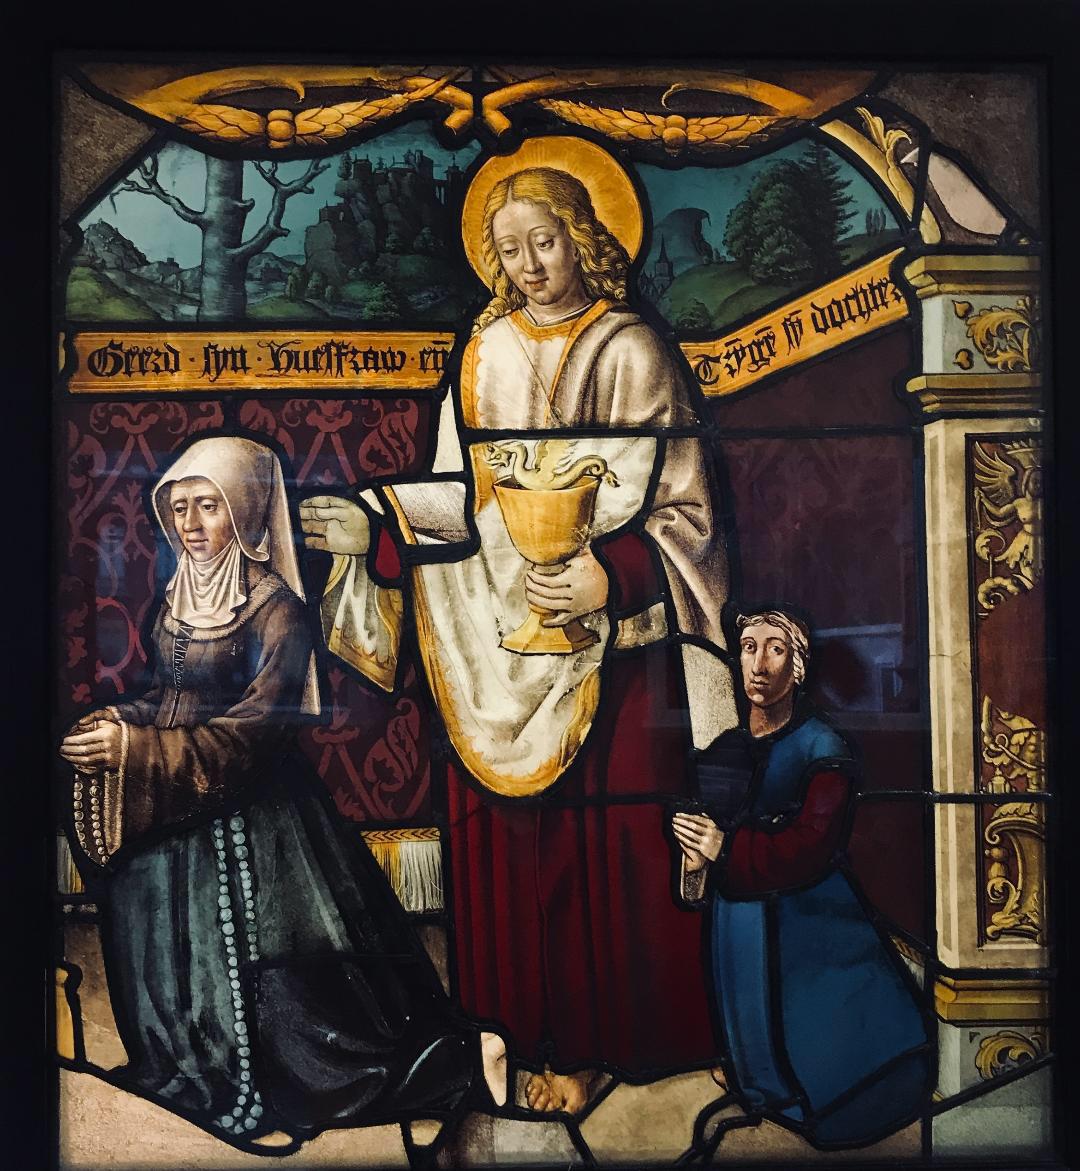 ST John the Evangelist; DRAGON